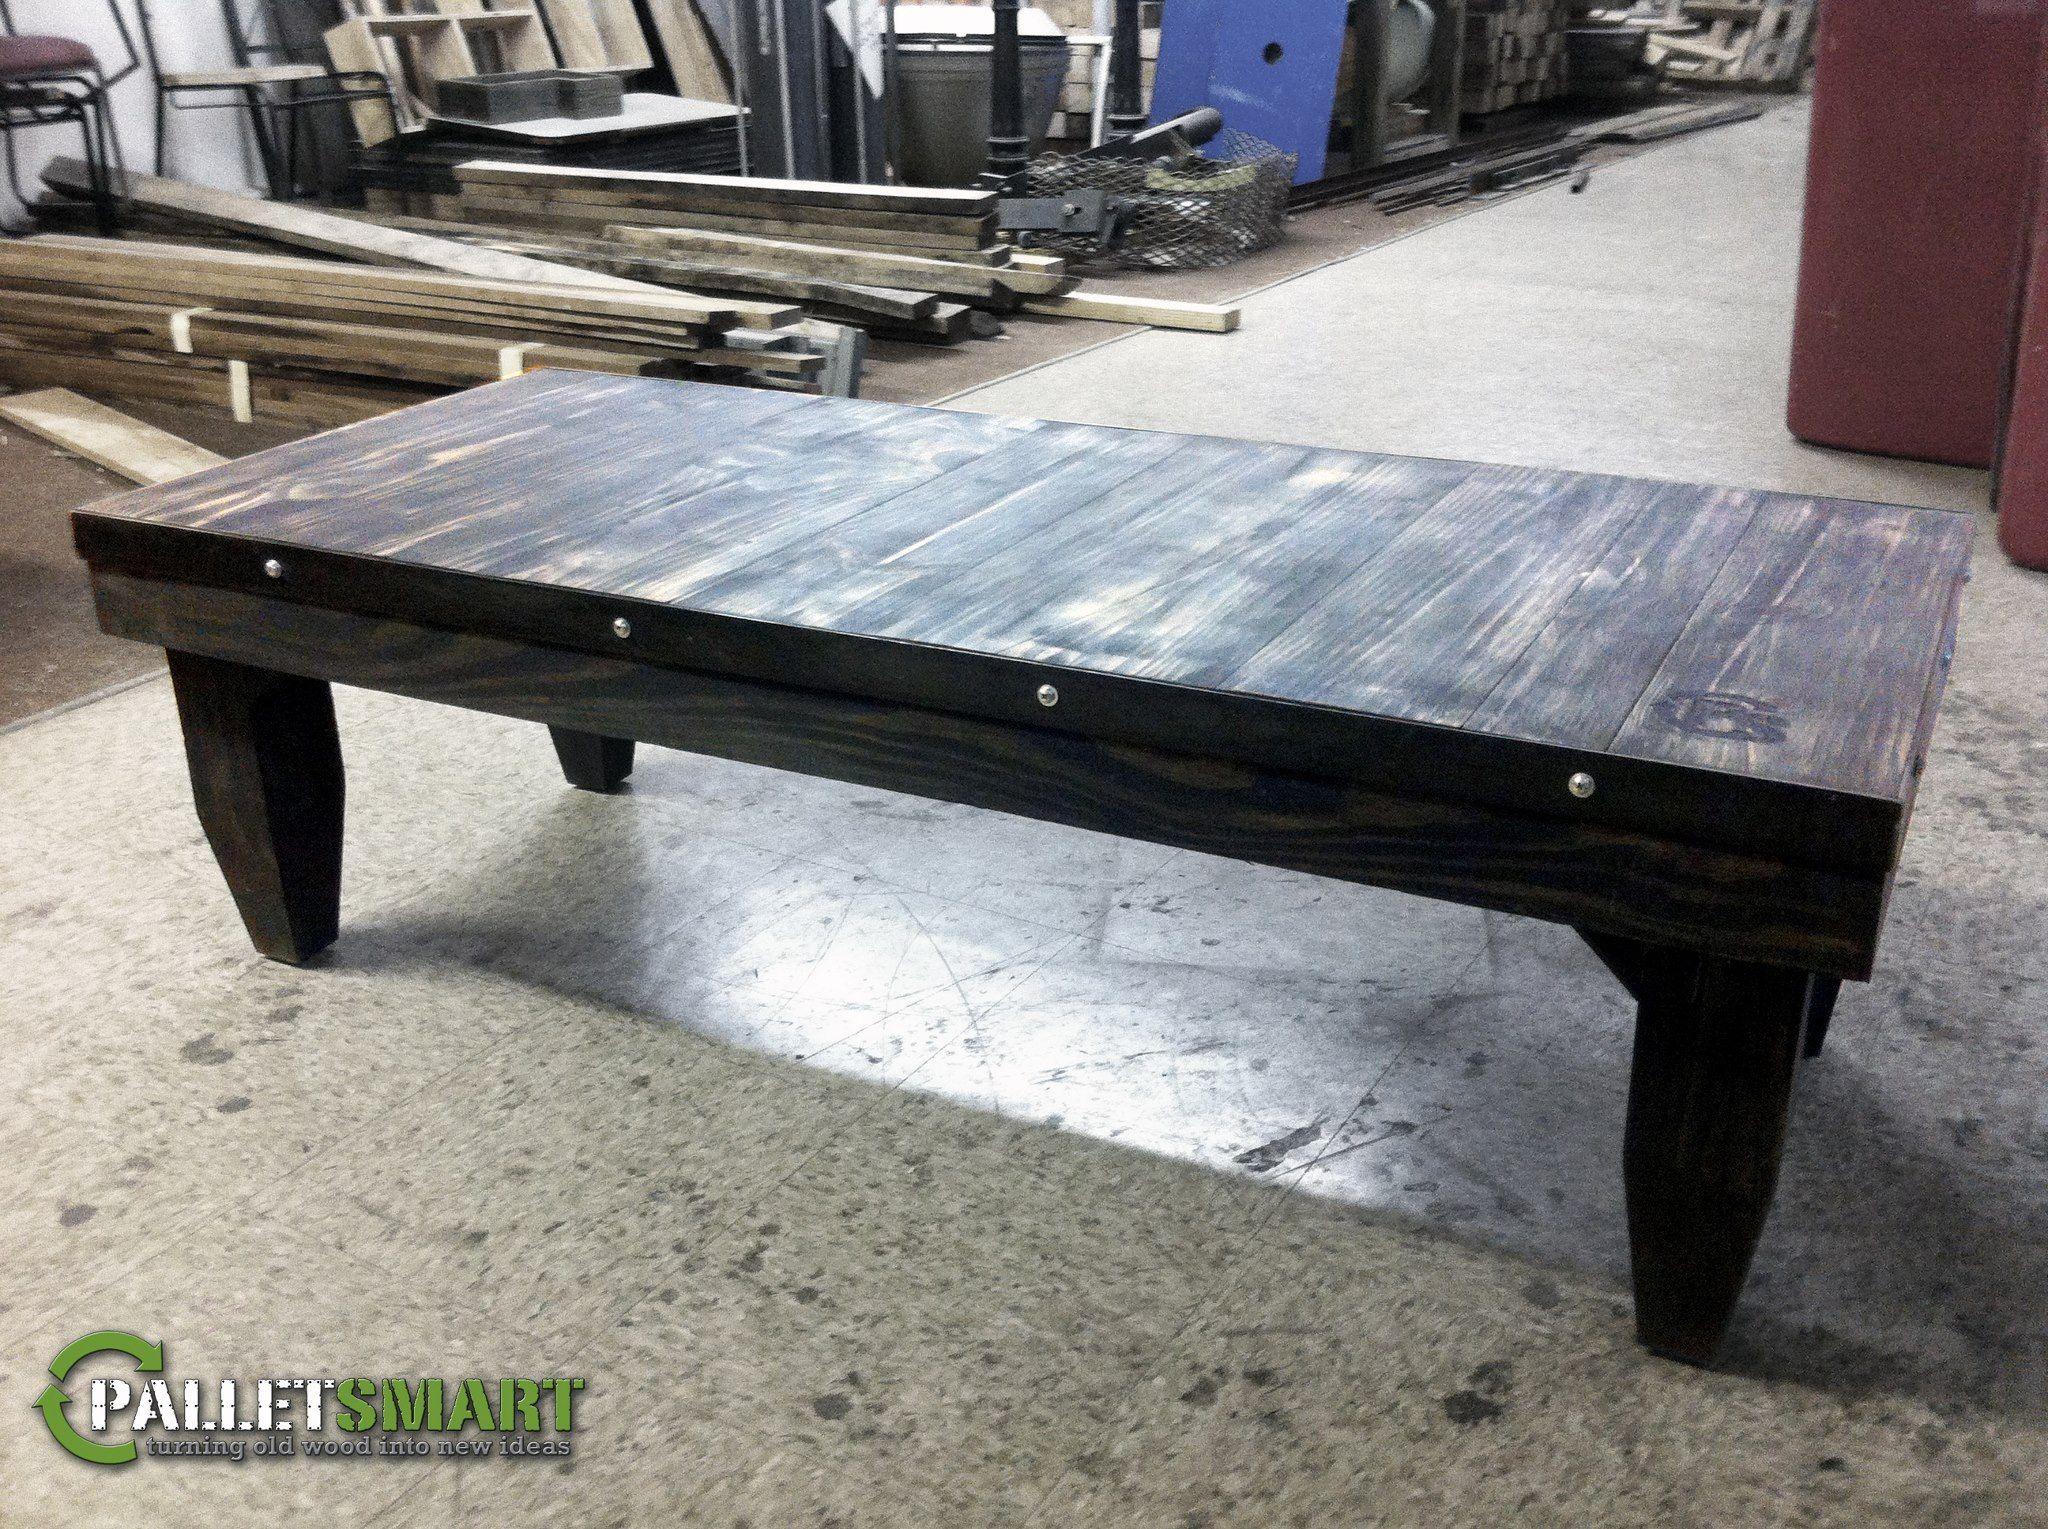 Repurposed pallet wood ebony distressed coffee table with metal